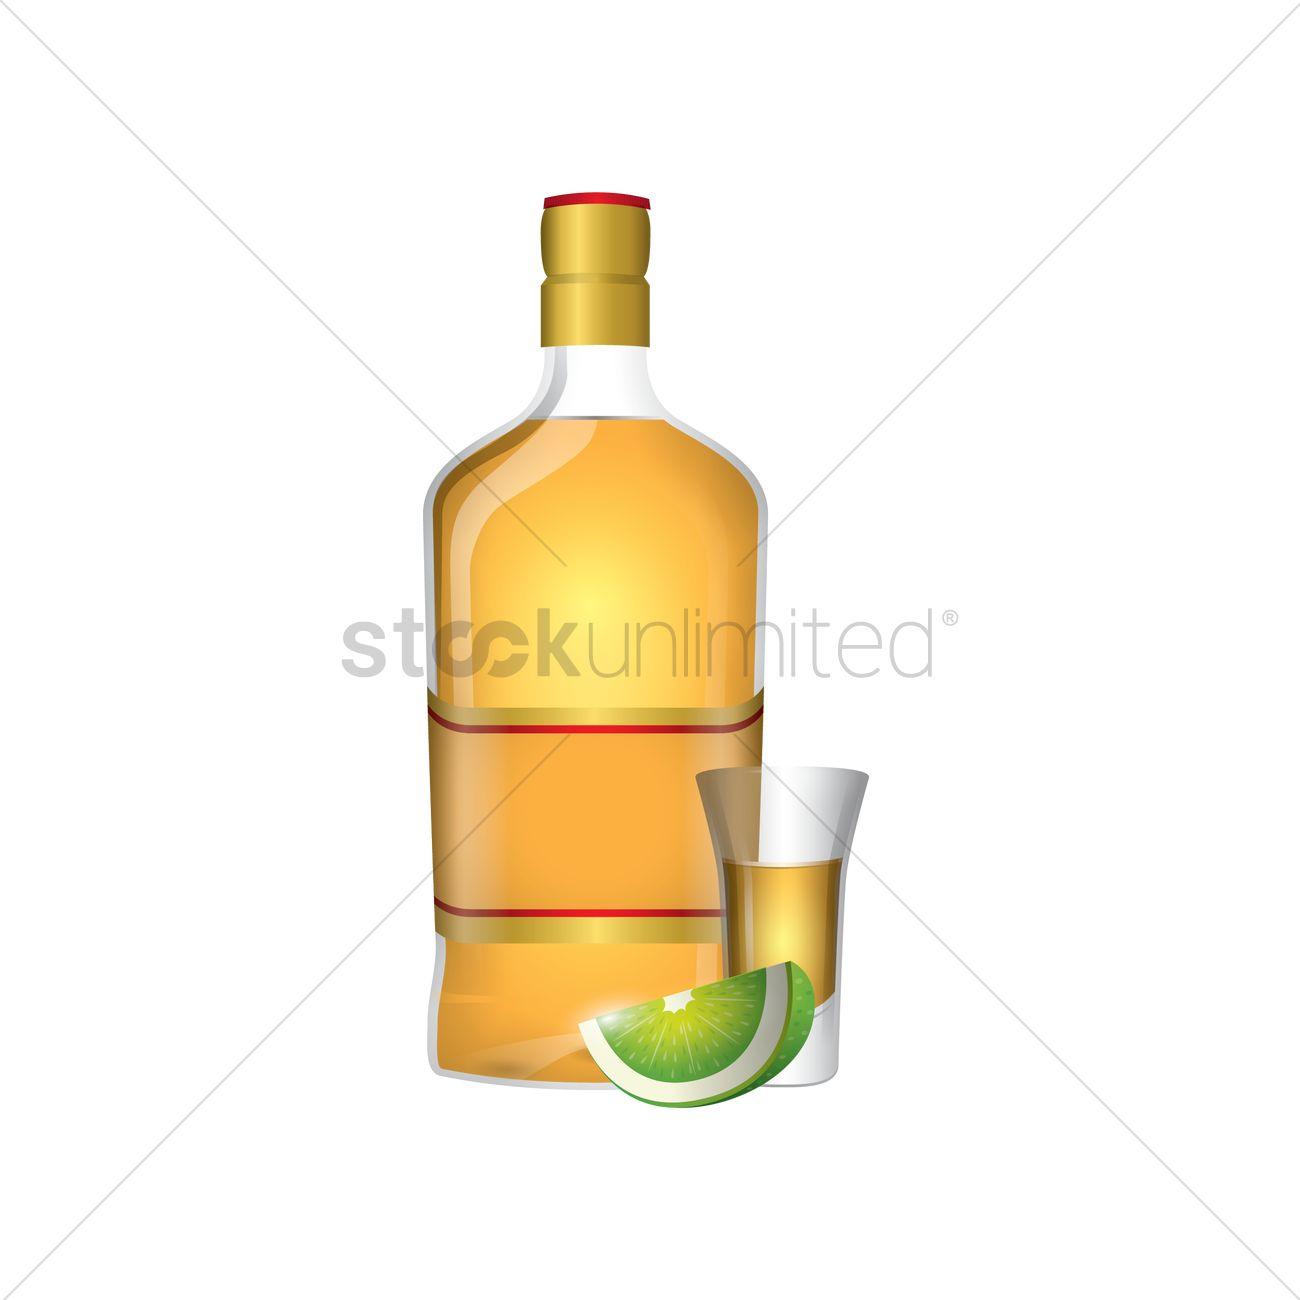 1300x1300 Tequila Shot Vector Image